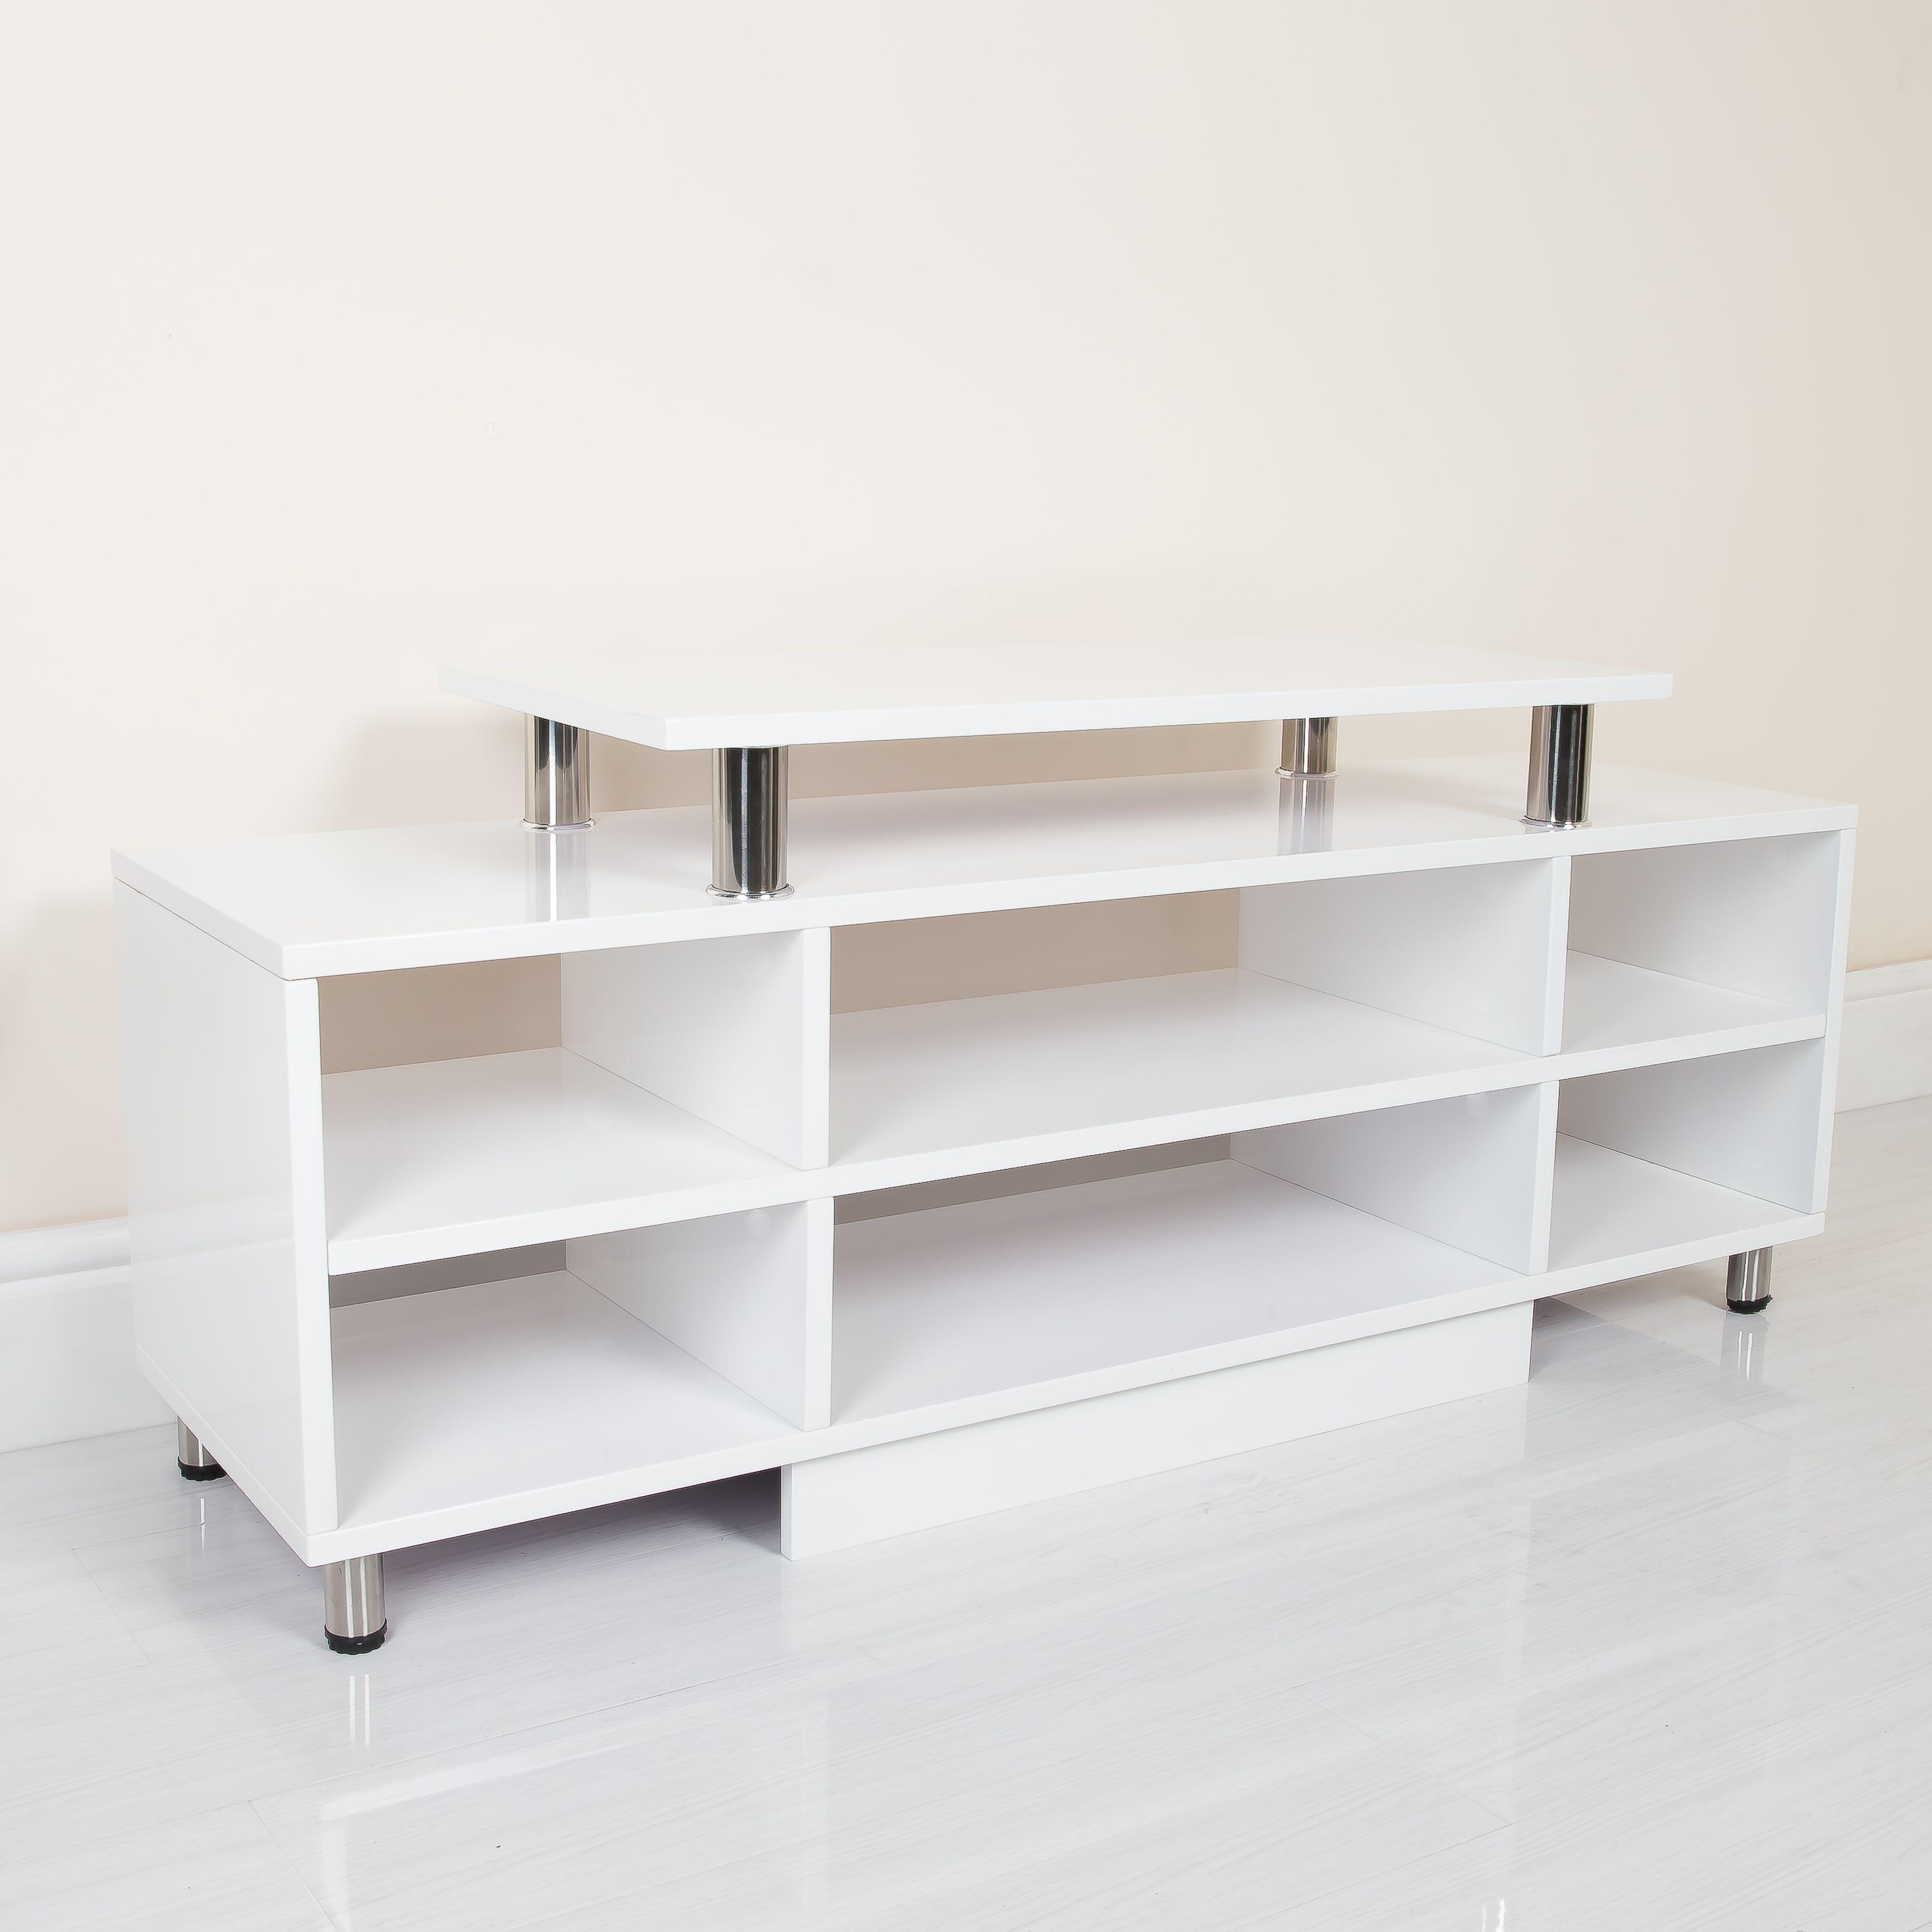 http://abreo.co.uk/living-room-furniture/modern-tv-stands/6-shelf ...